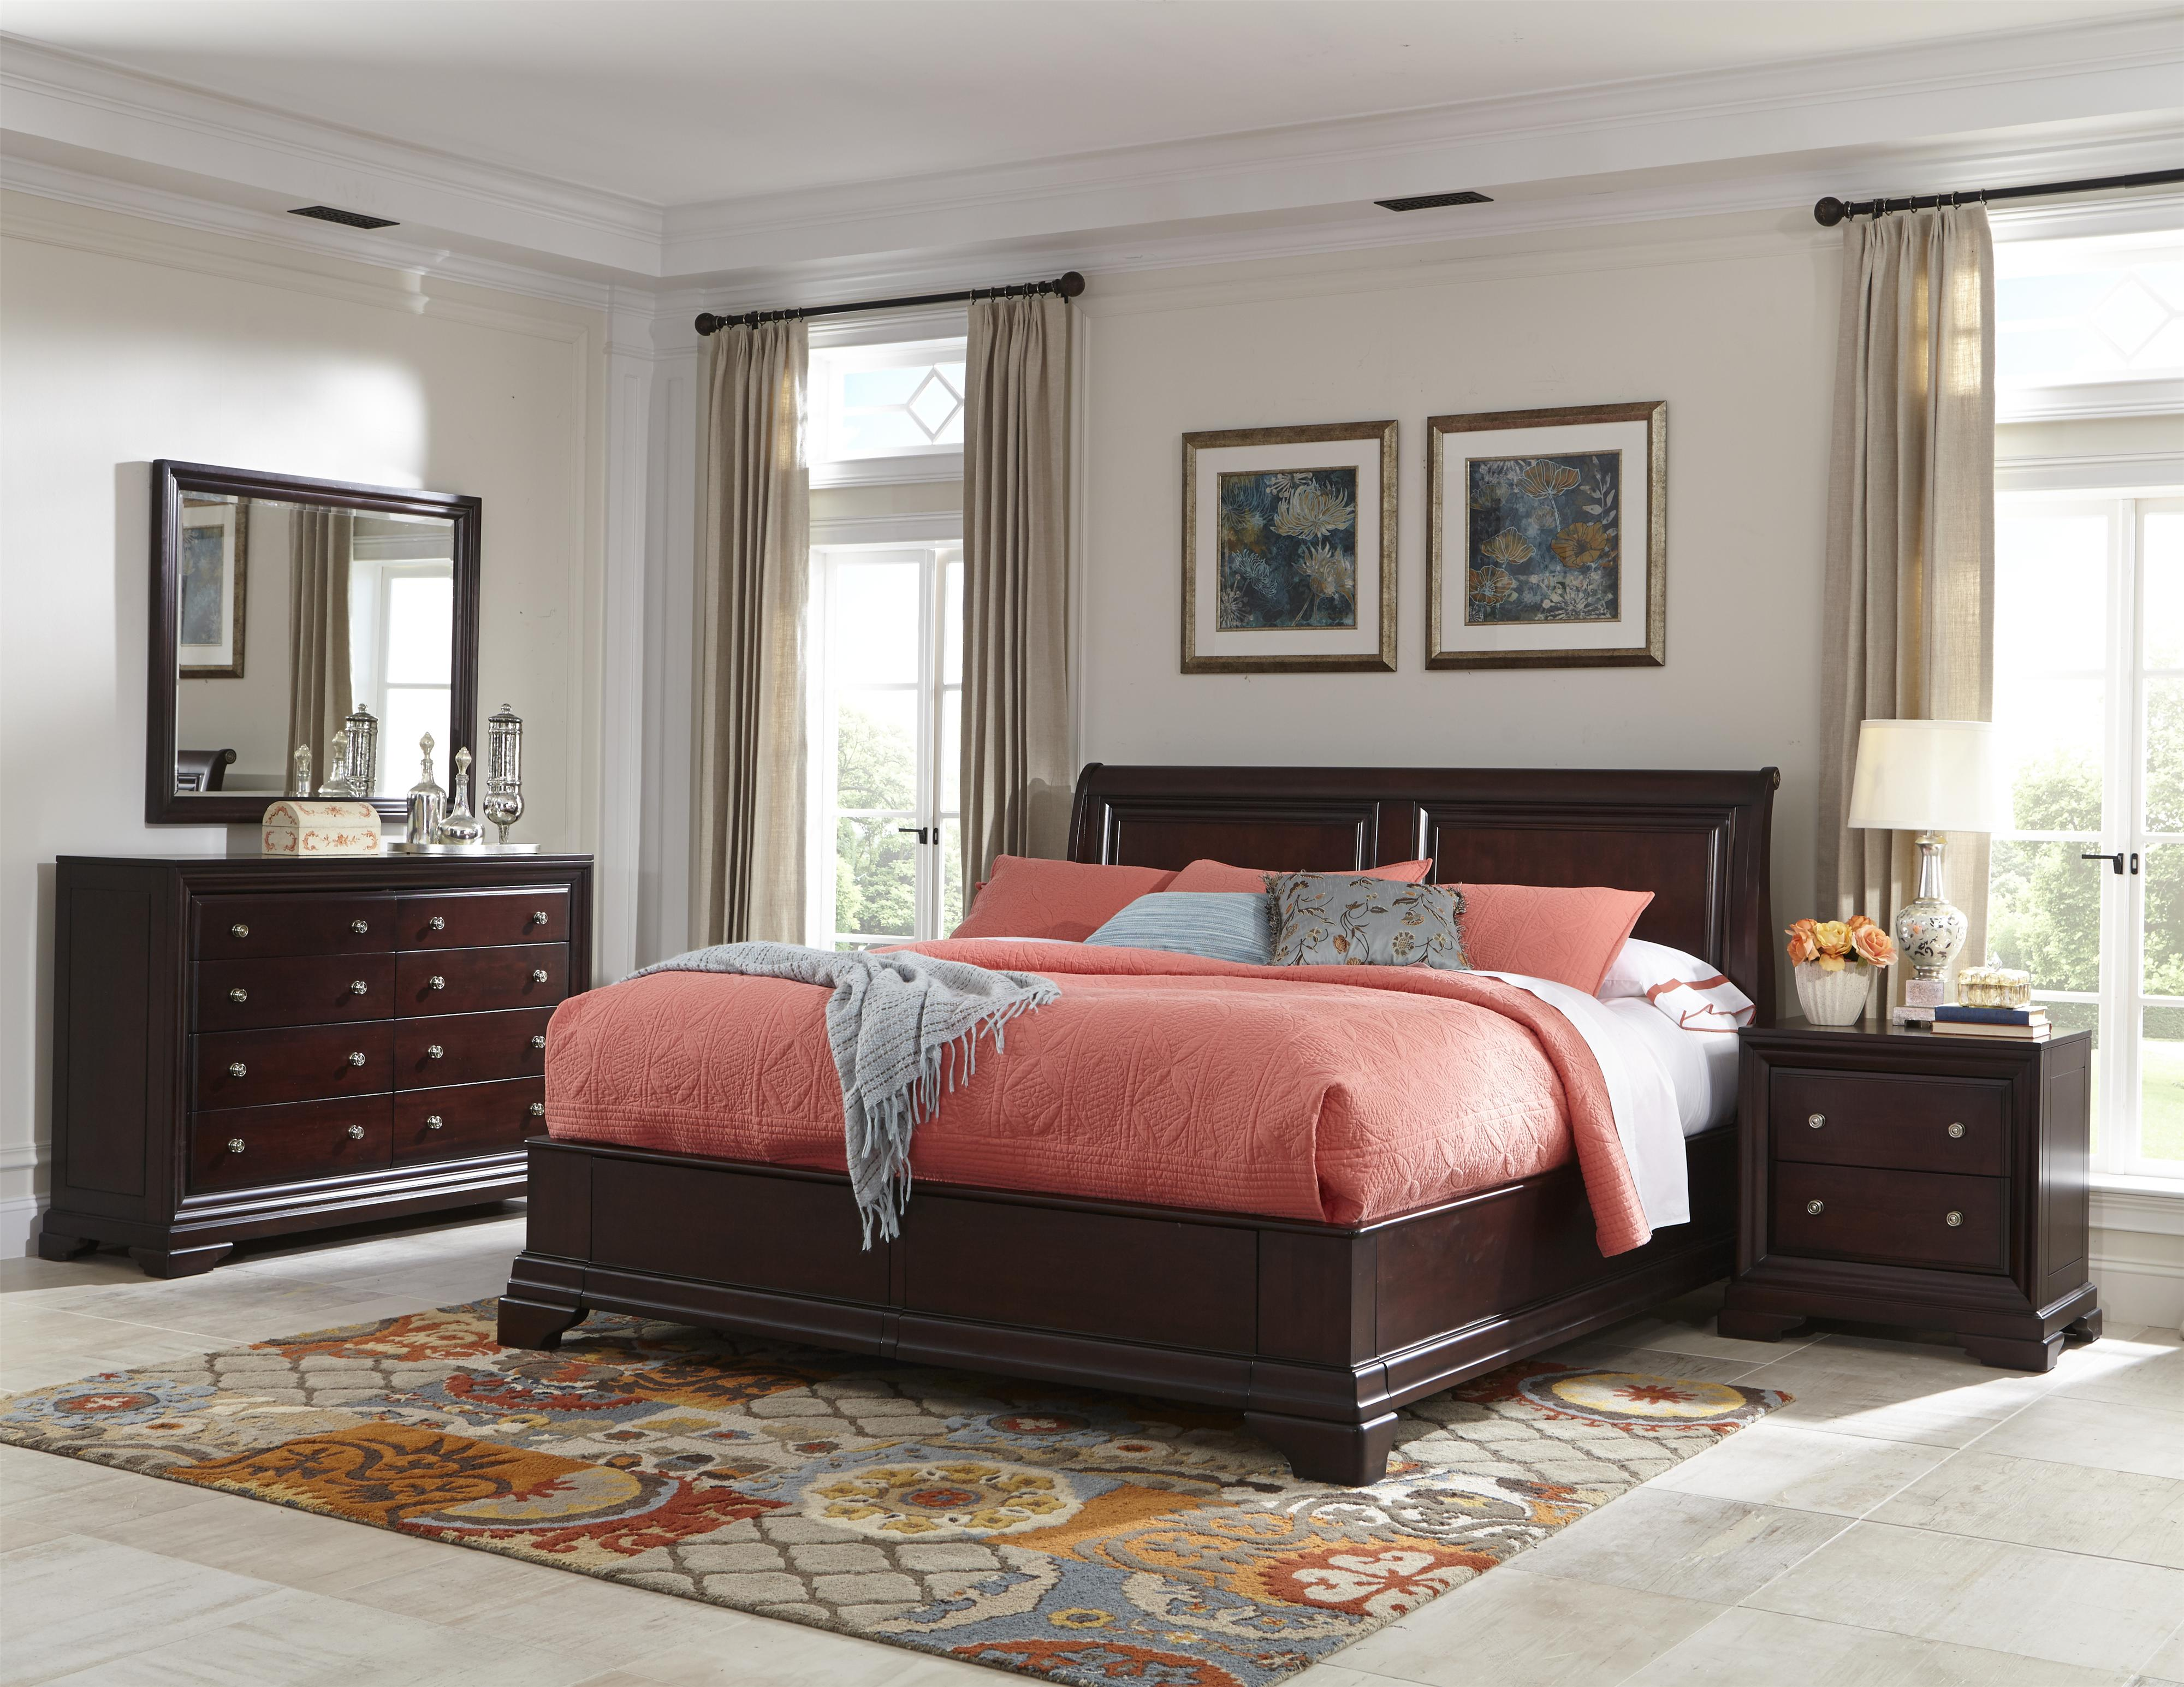 Cresent Fine Furniture Newport California King Bedroom Group - Item Number: 1800 CK Bedroom Group 3